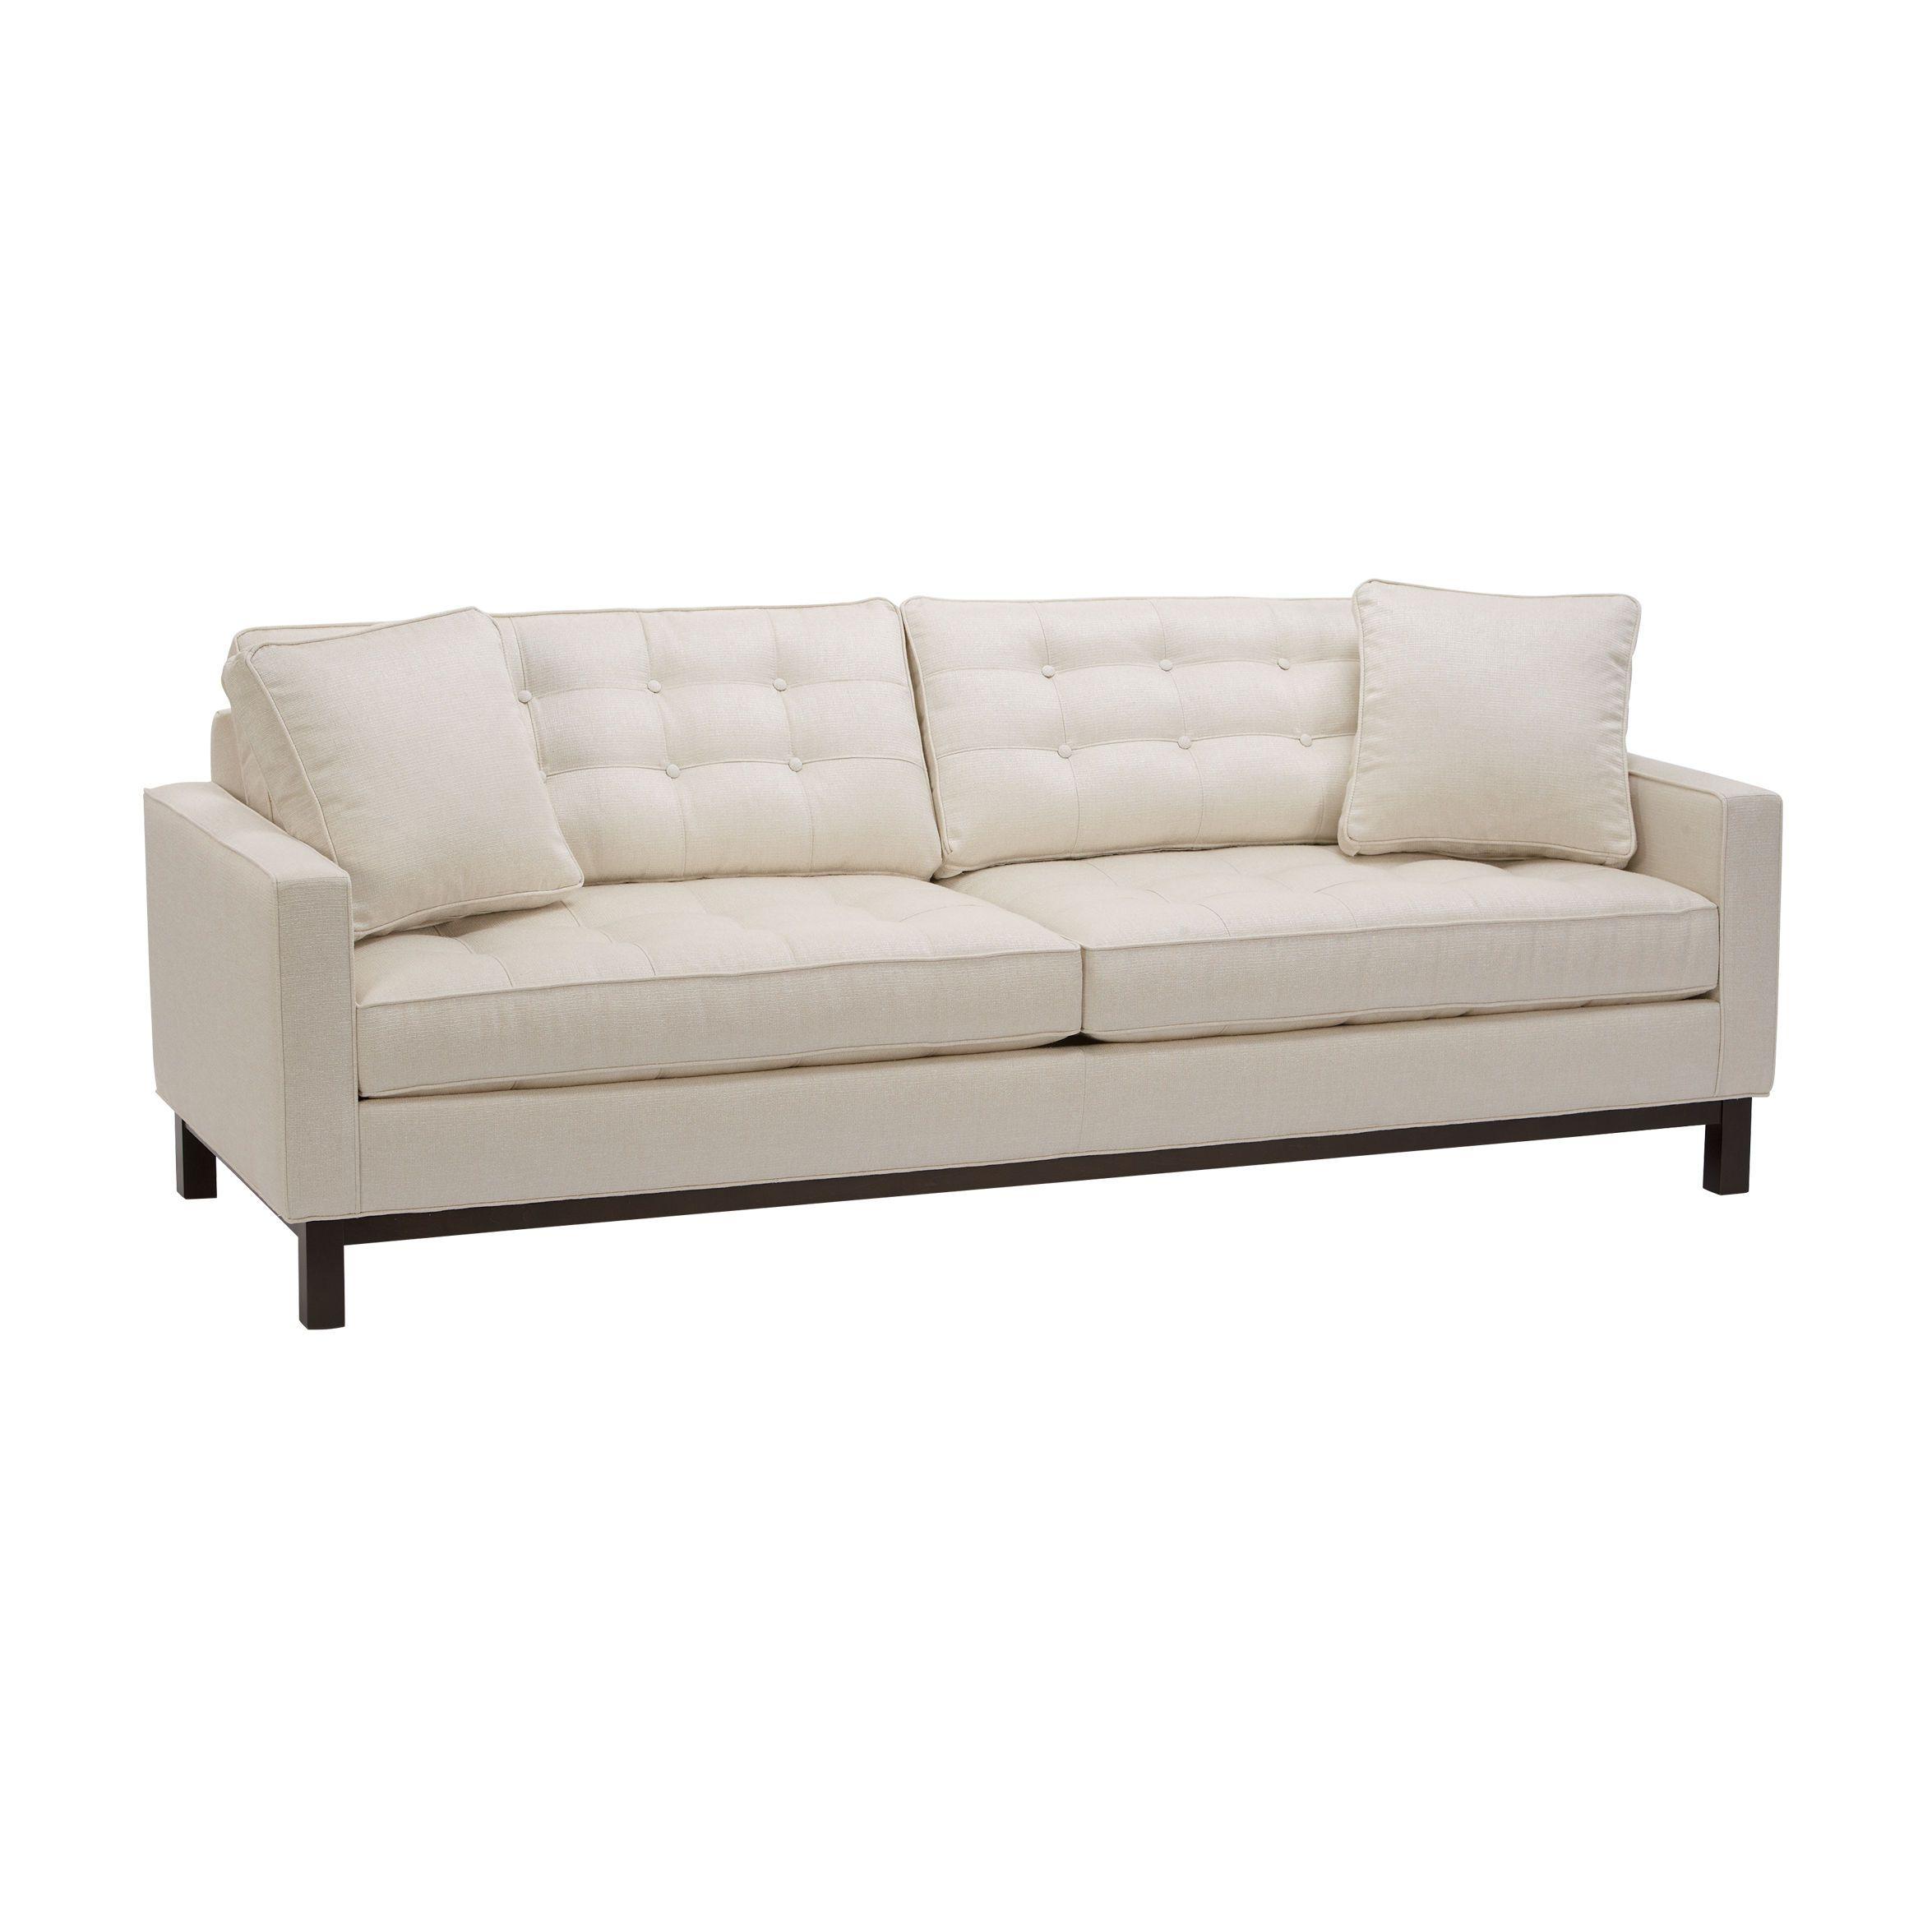 Ethan Allen 39 S Newest Modern Sofa The Melrose Ethan Allen Furniture Ethan Allen Sofas Ethan